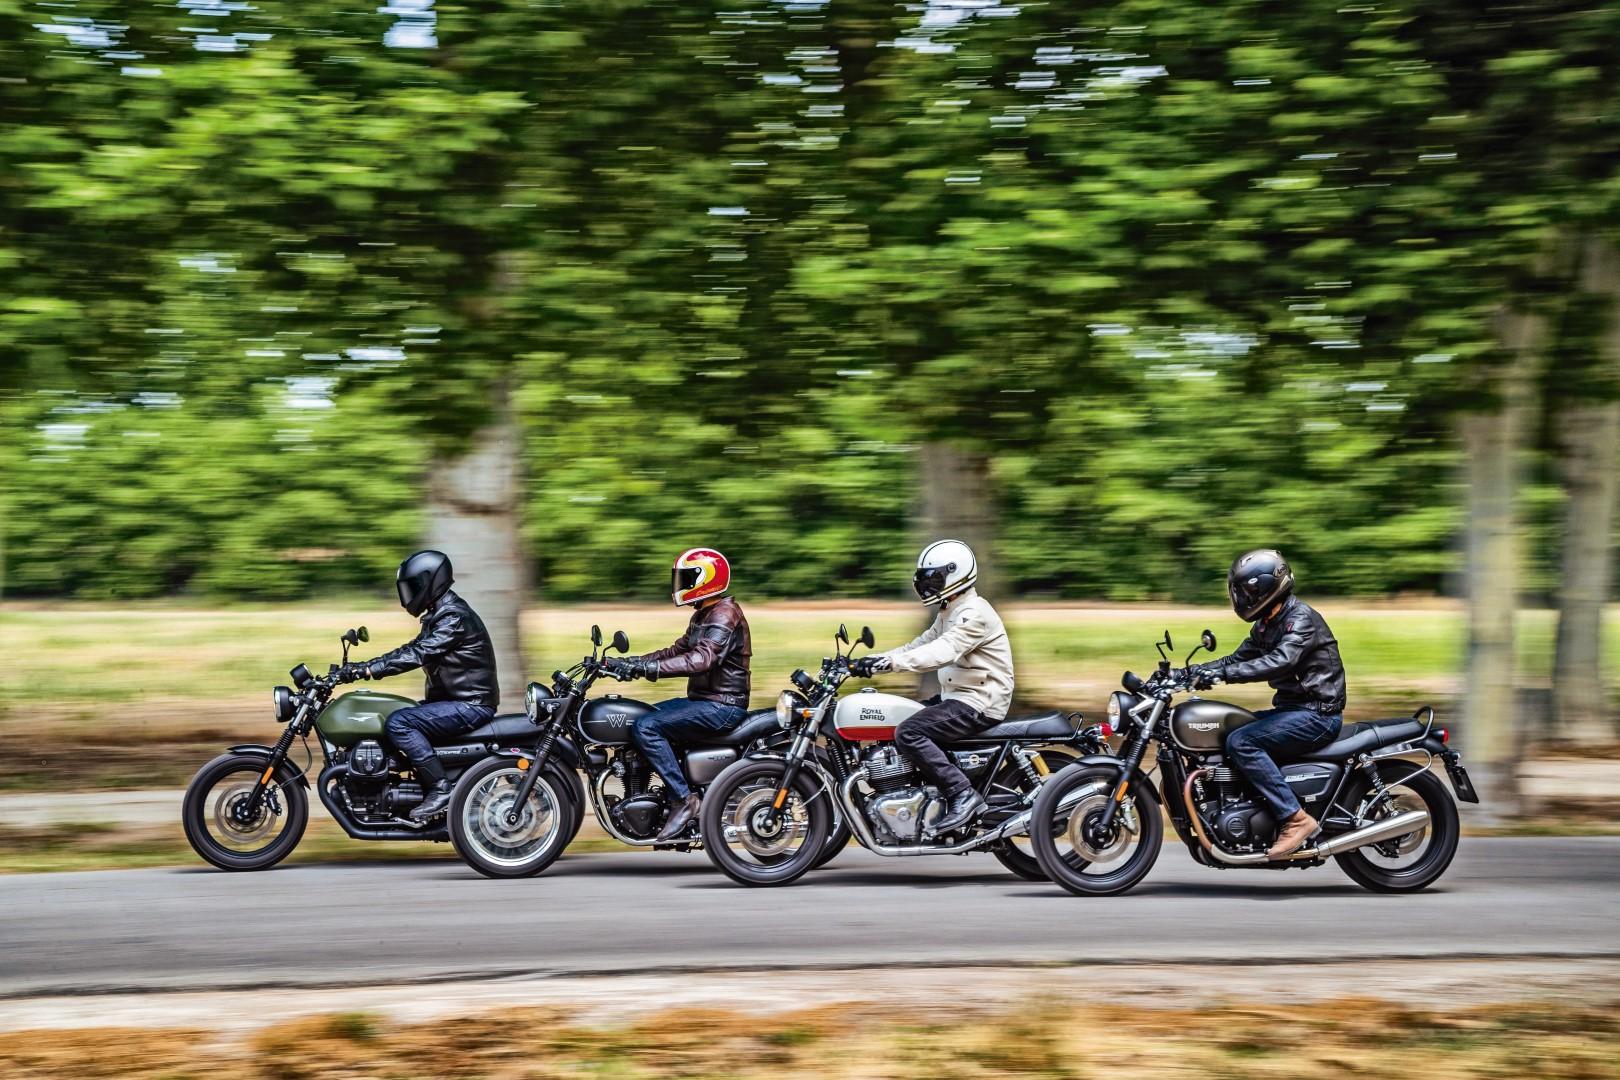 Comparativa retro: Kawasaki W800 Street, Moto Guzzi V7 III Stone, Royal Enfield Interceptor 650, Triumph Street Twin